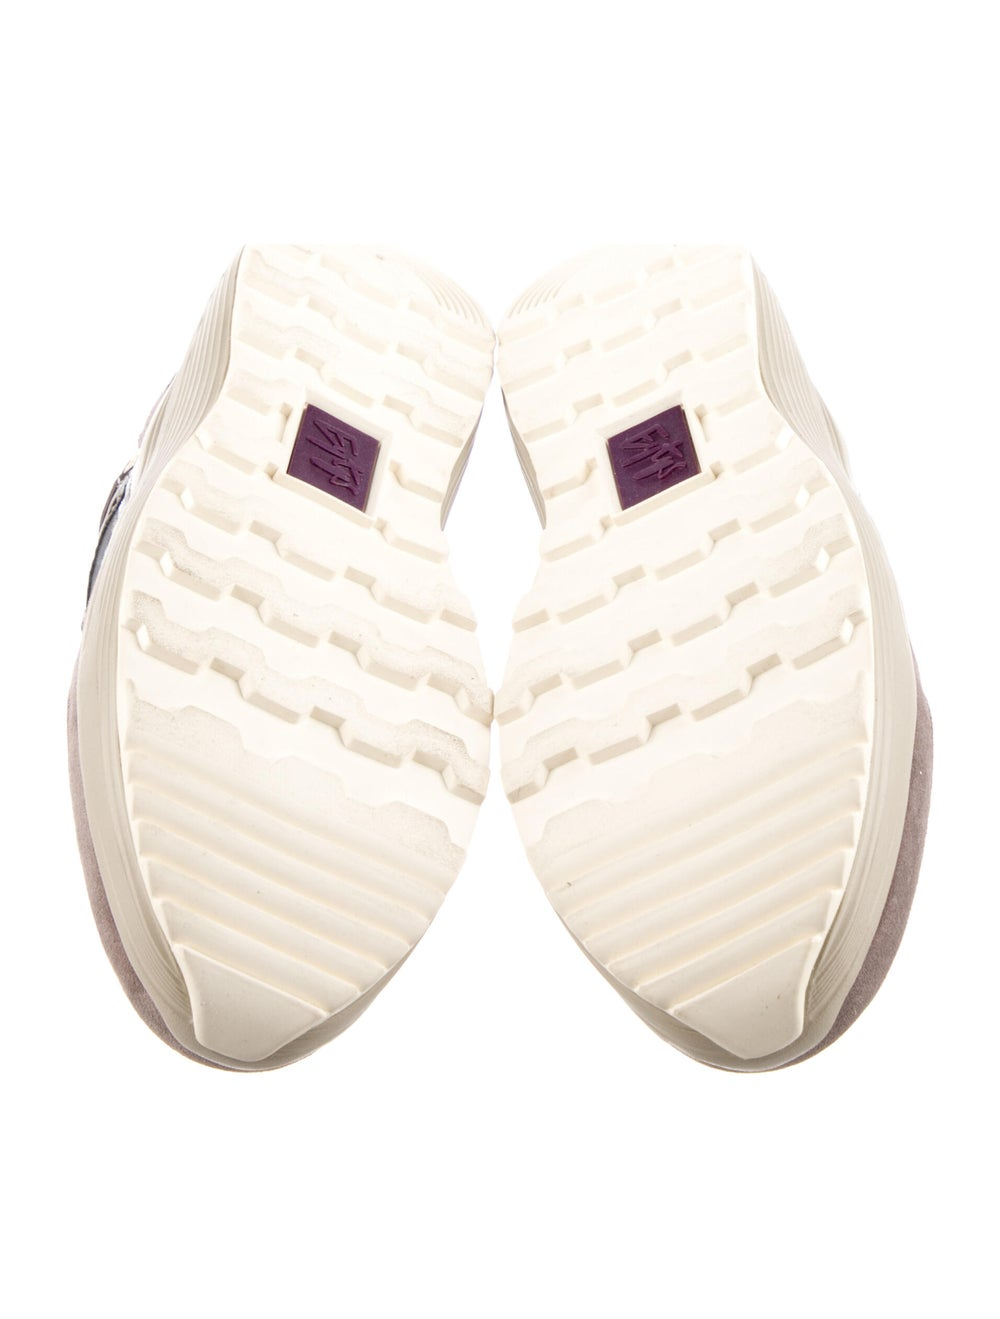 Eytys Jet Iron Sneakers - image 5